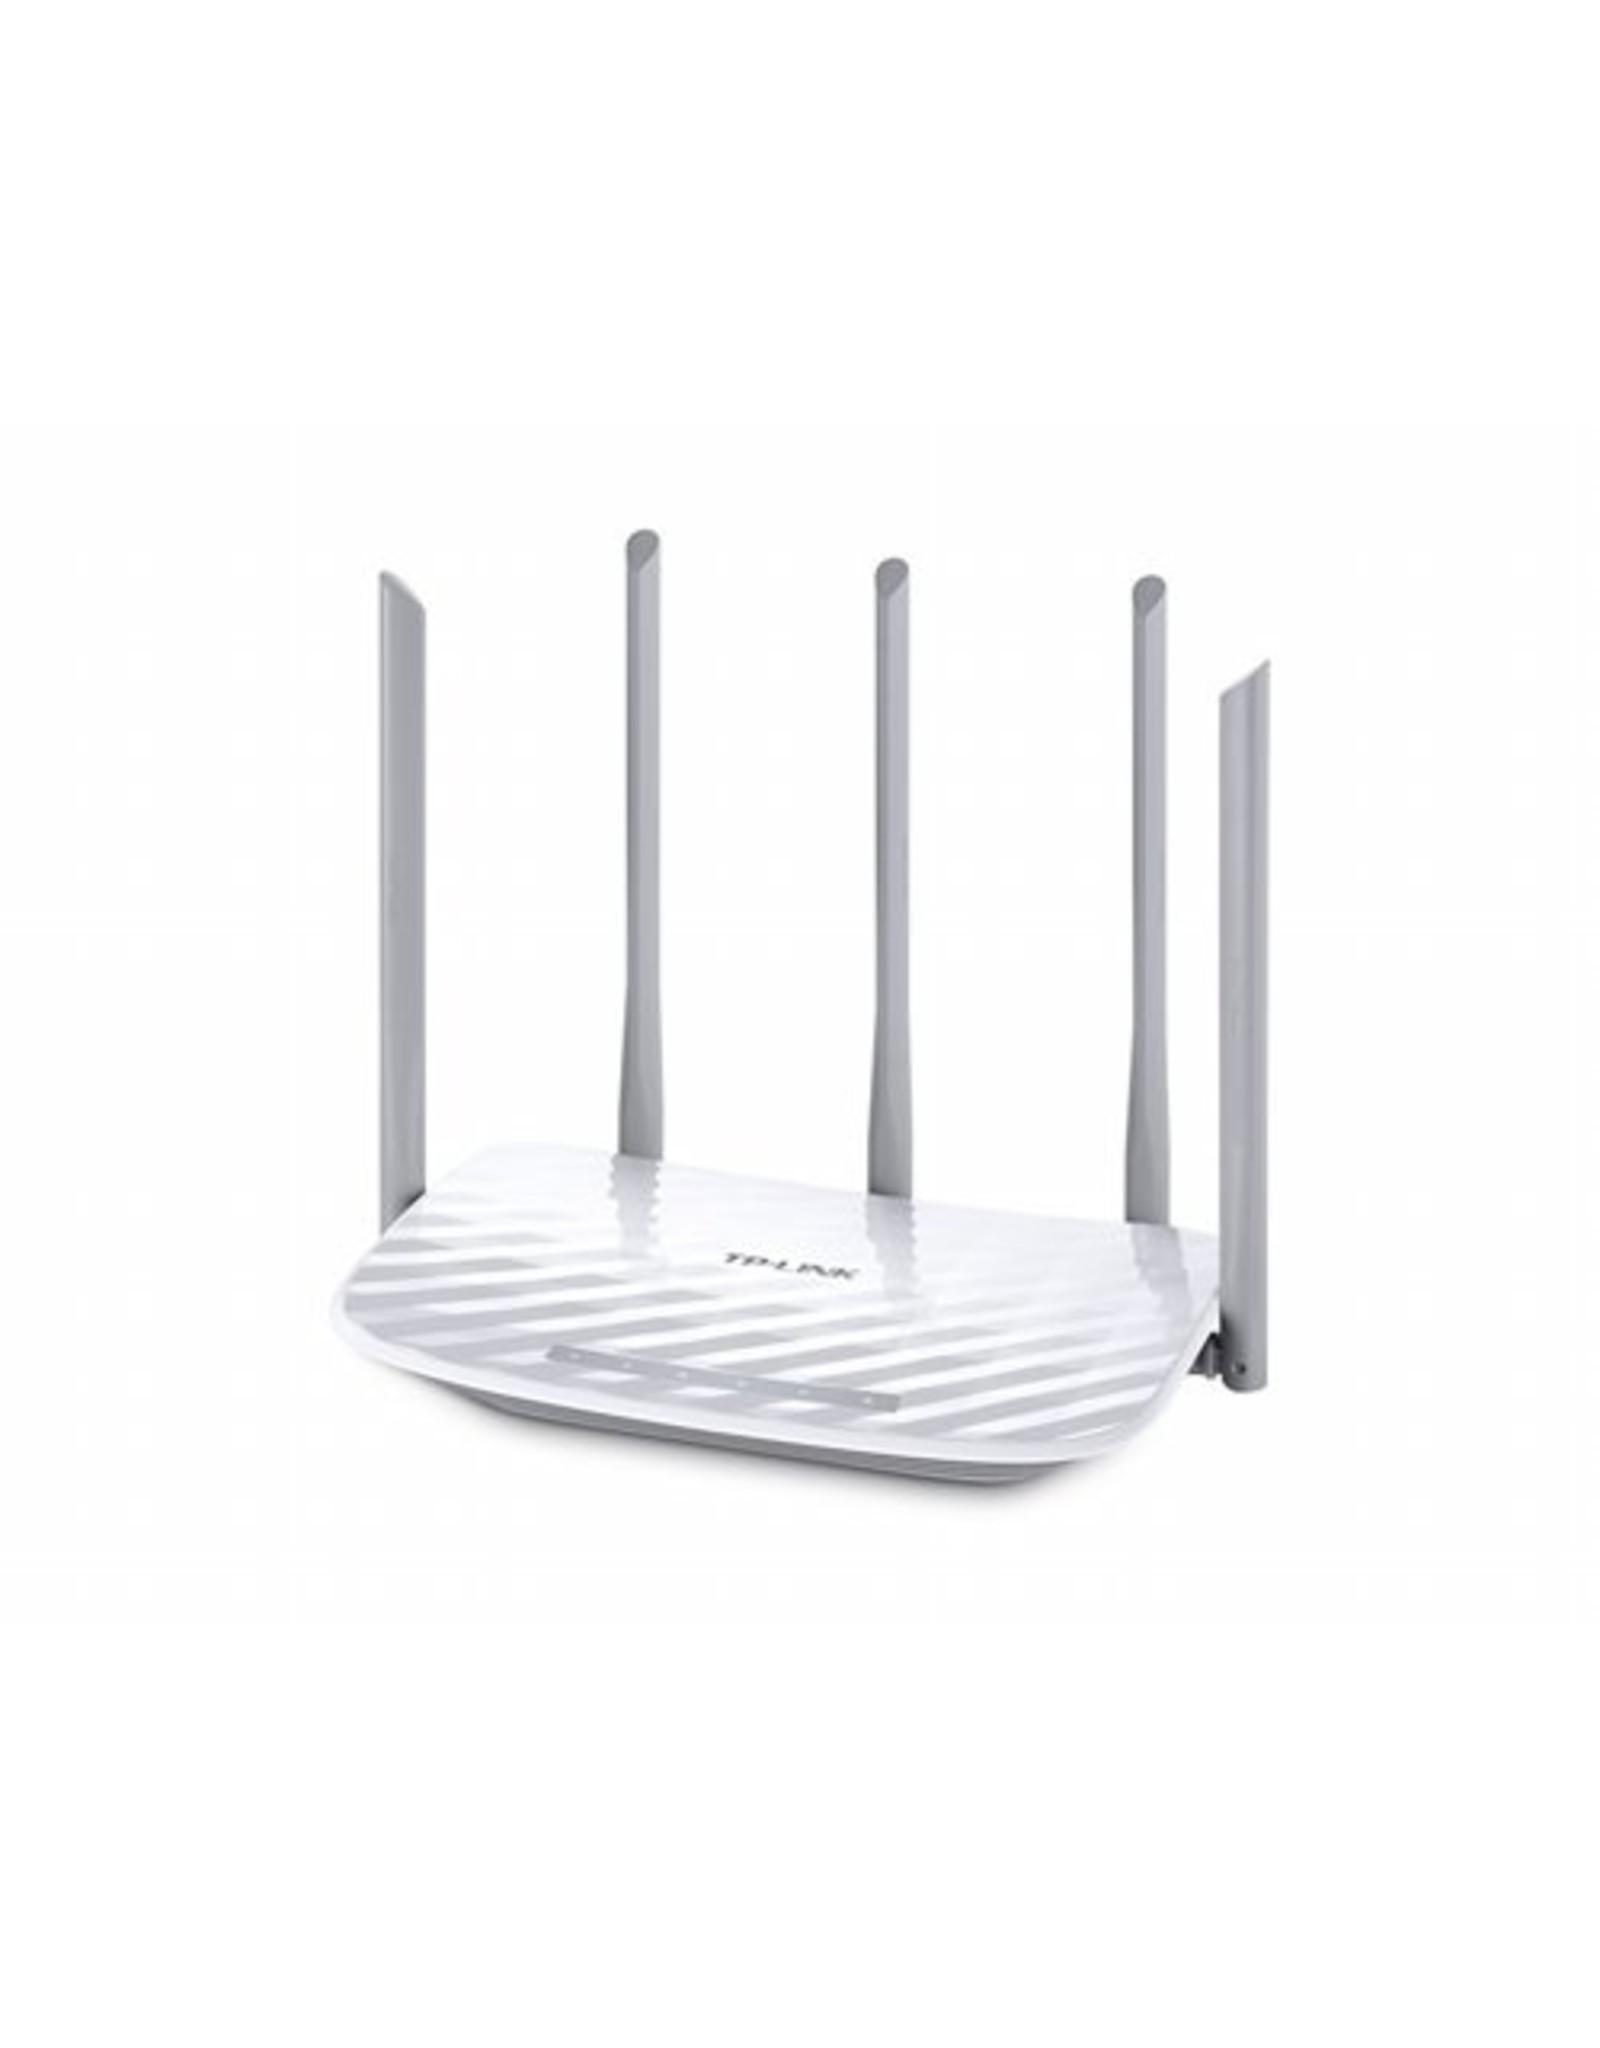 TP-Link ArcherC60 AC1350 Wireless Router